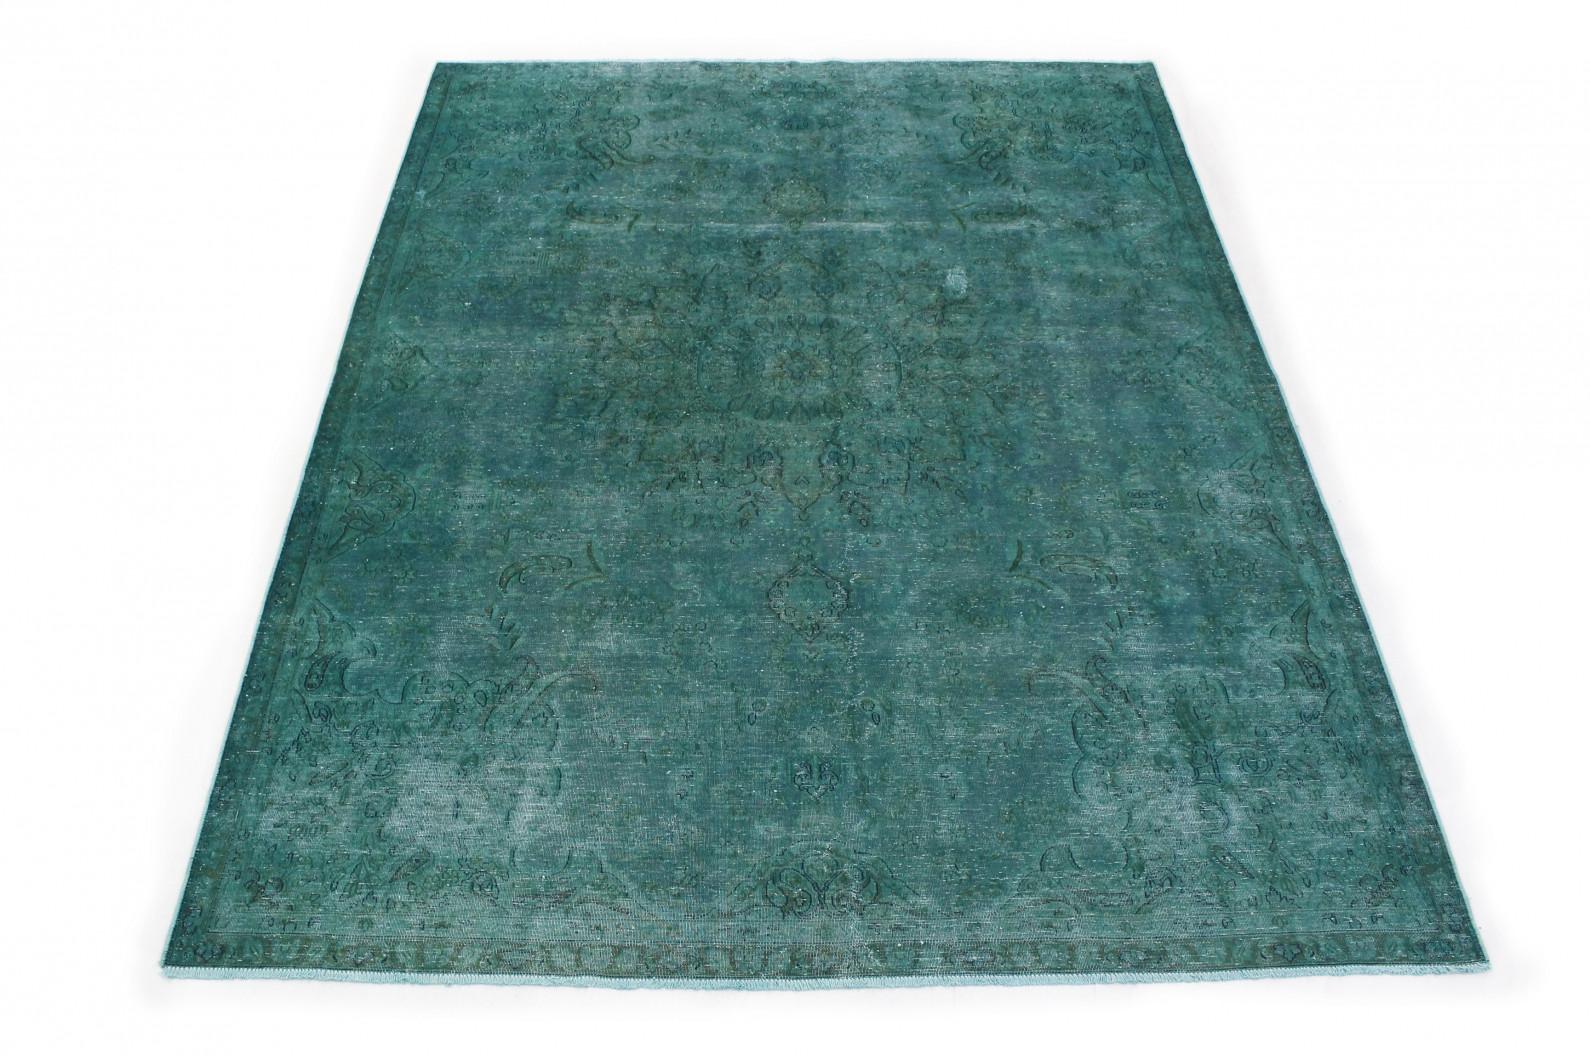 vintage teppich gr n in 300x220 1001 167228 bei kaufen. Black Bedroom Furniture Sets. Home Design Ideas